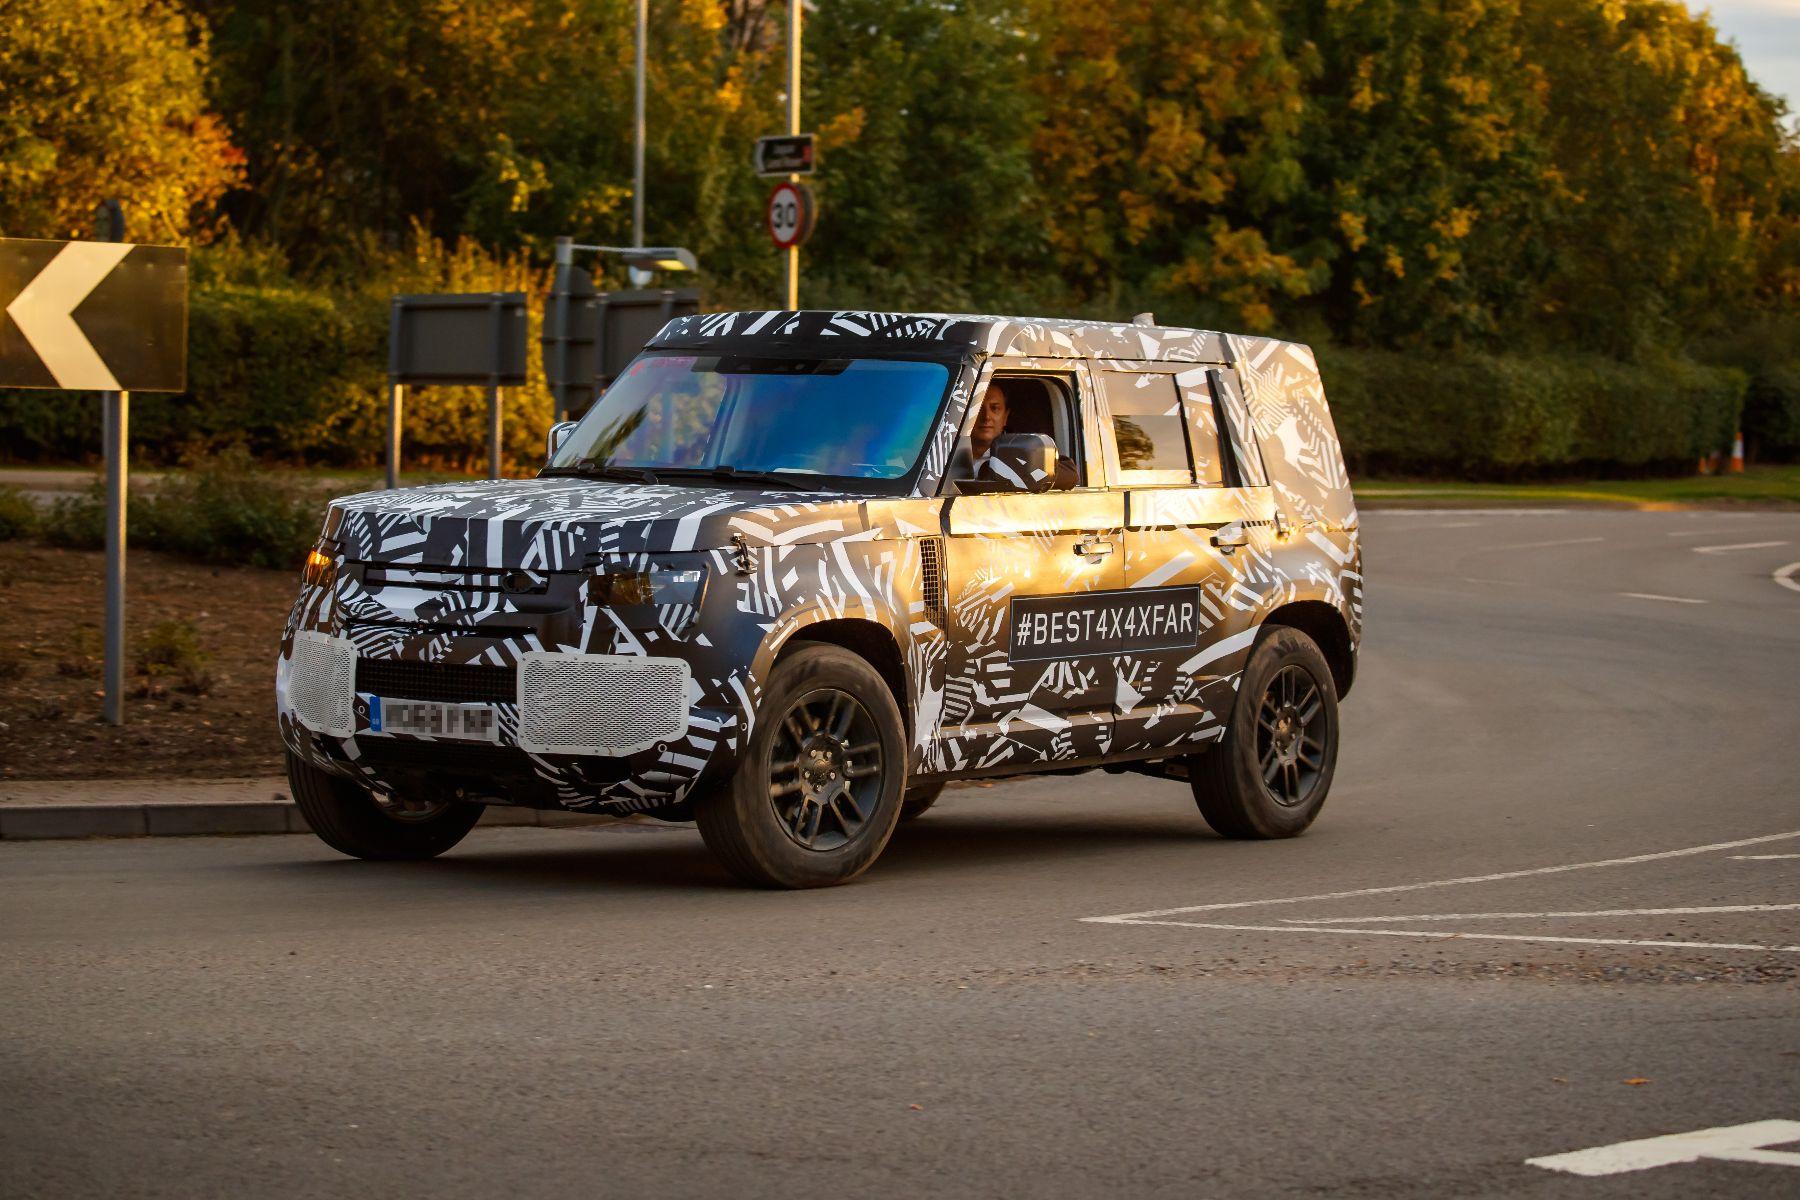 Image property of motoringresearch.com